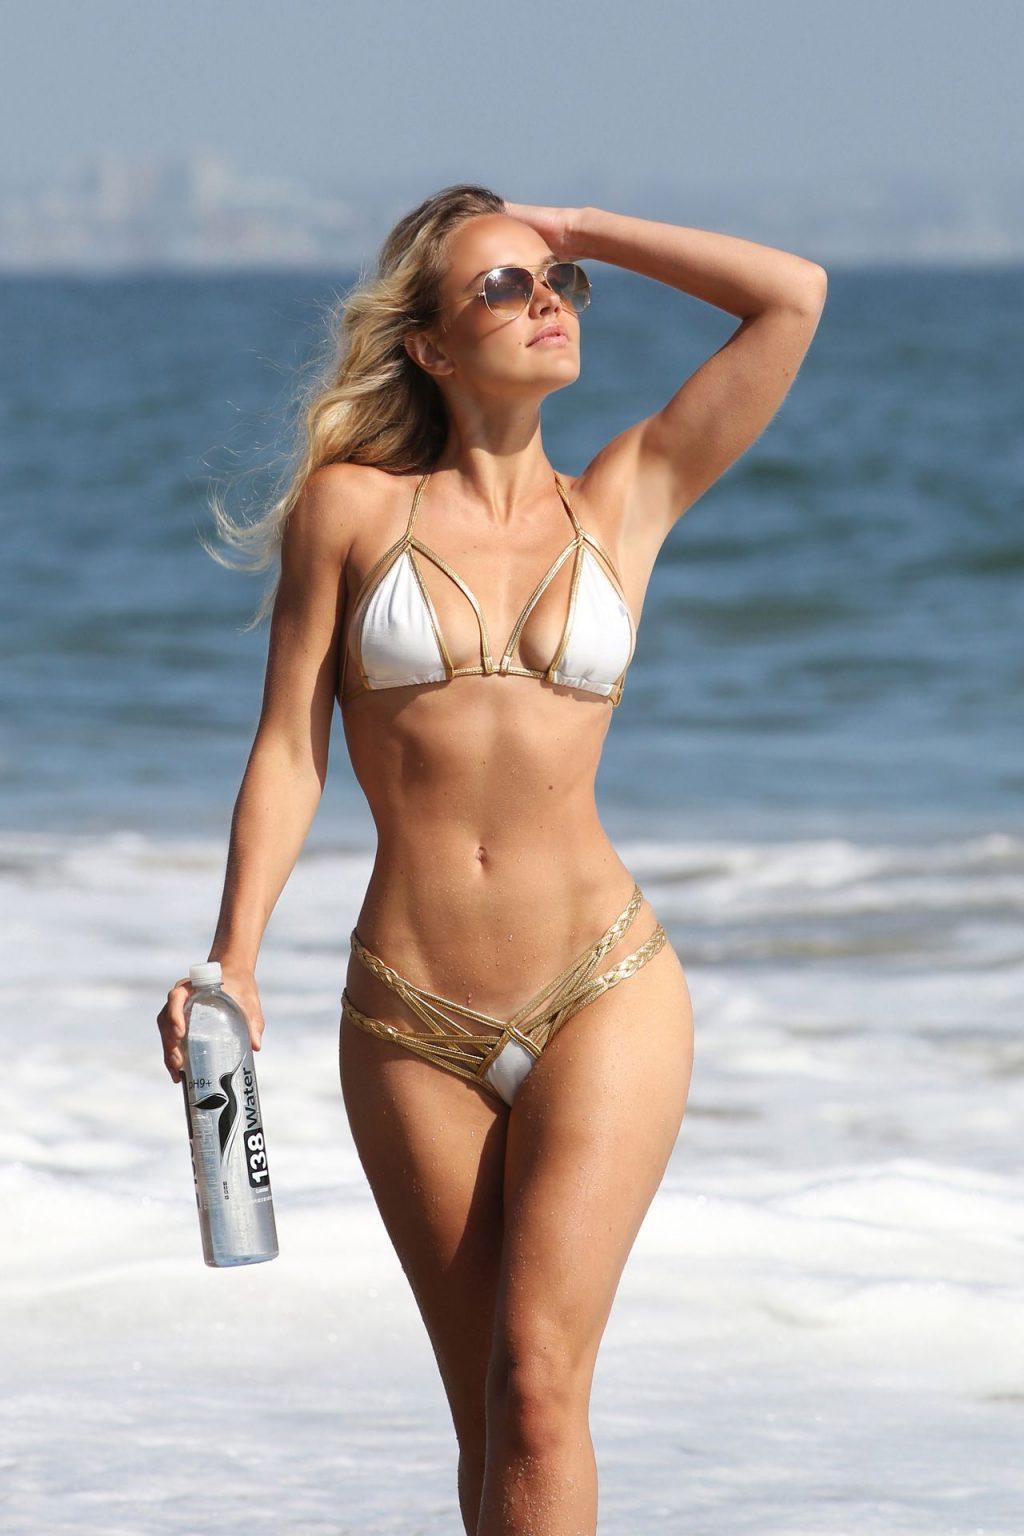 Dasha Inyutkina Shows Off Her Sexy Beach Body In a Bikini (38 Photos)